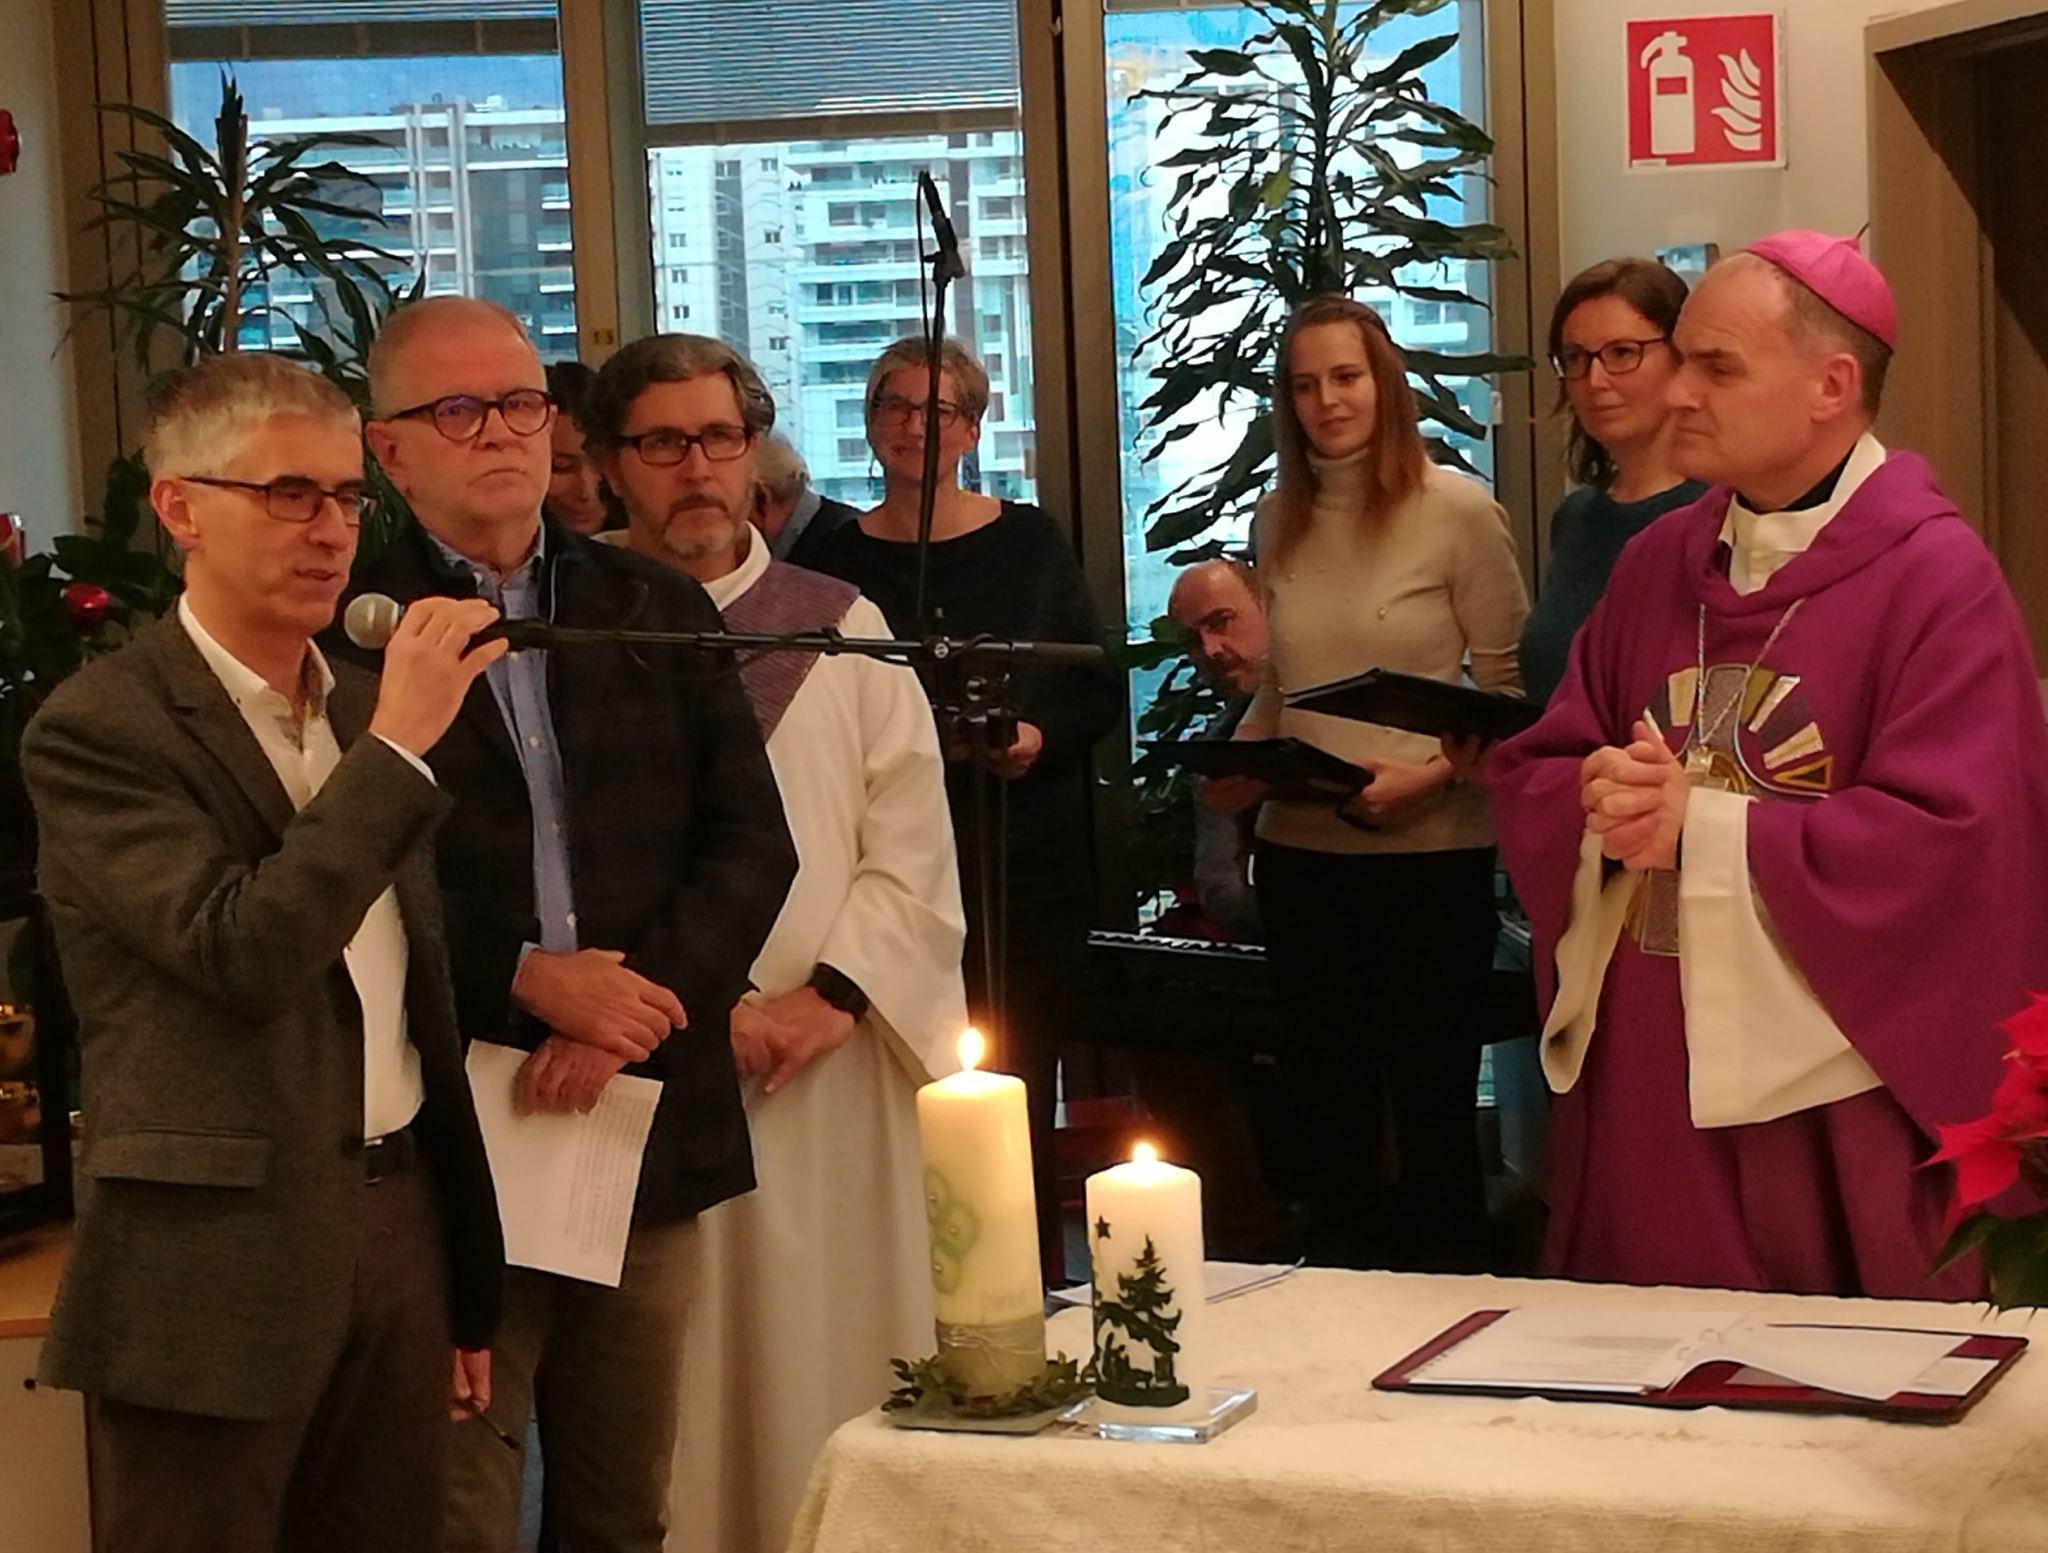 v.l.: Primar Massimo Bernardo, Sanitätskoordinator Dr. Roland Döcker, Bischof Ivo Muser